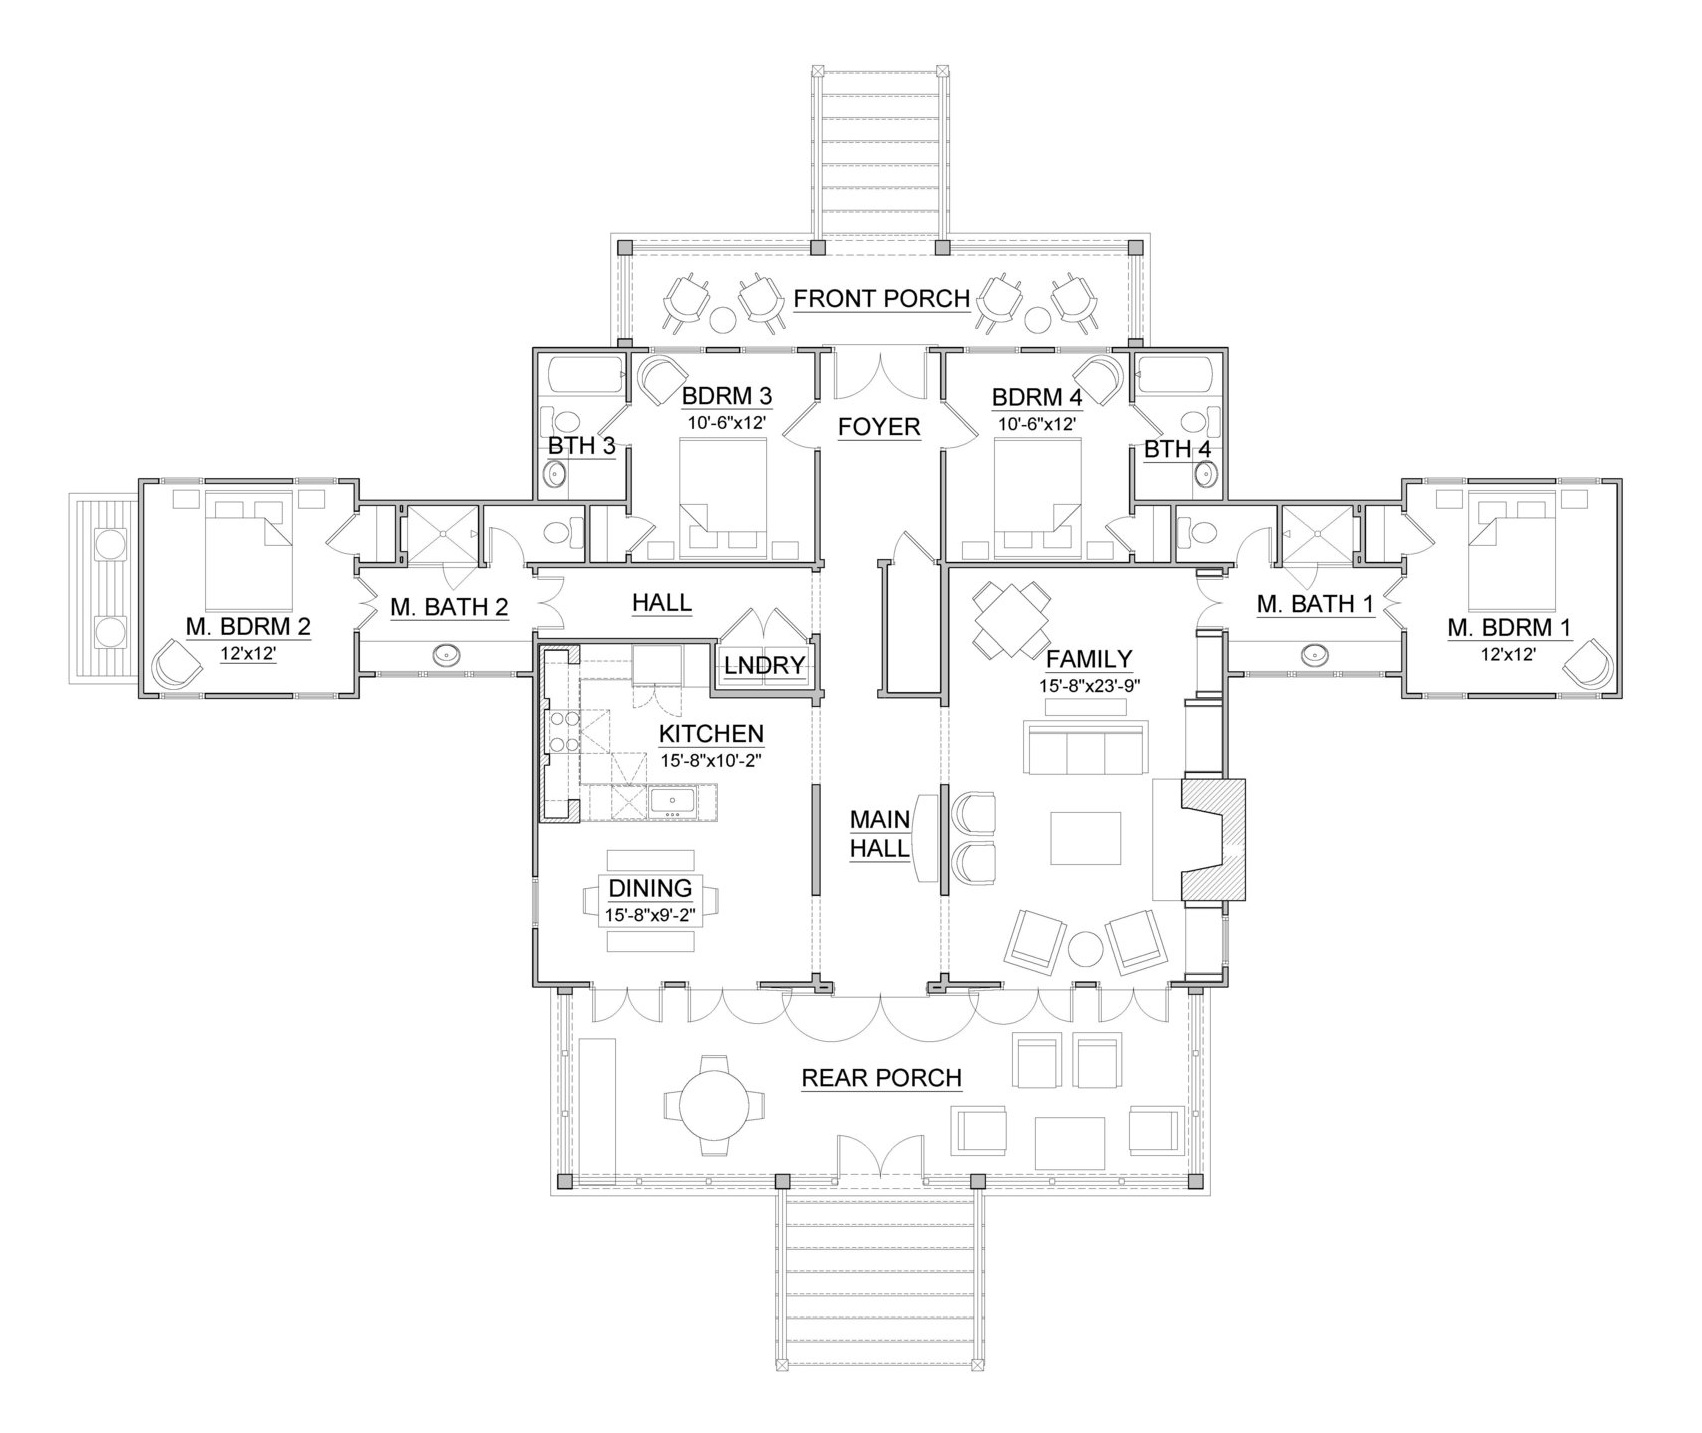 McCoy_First Floor_24x36.jpg